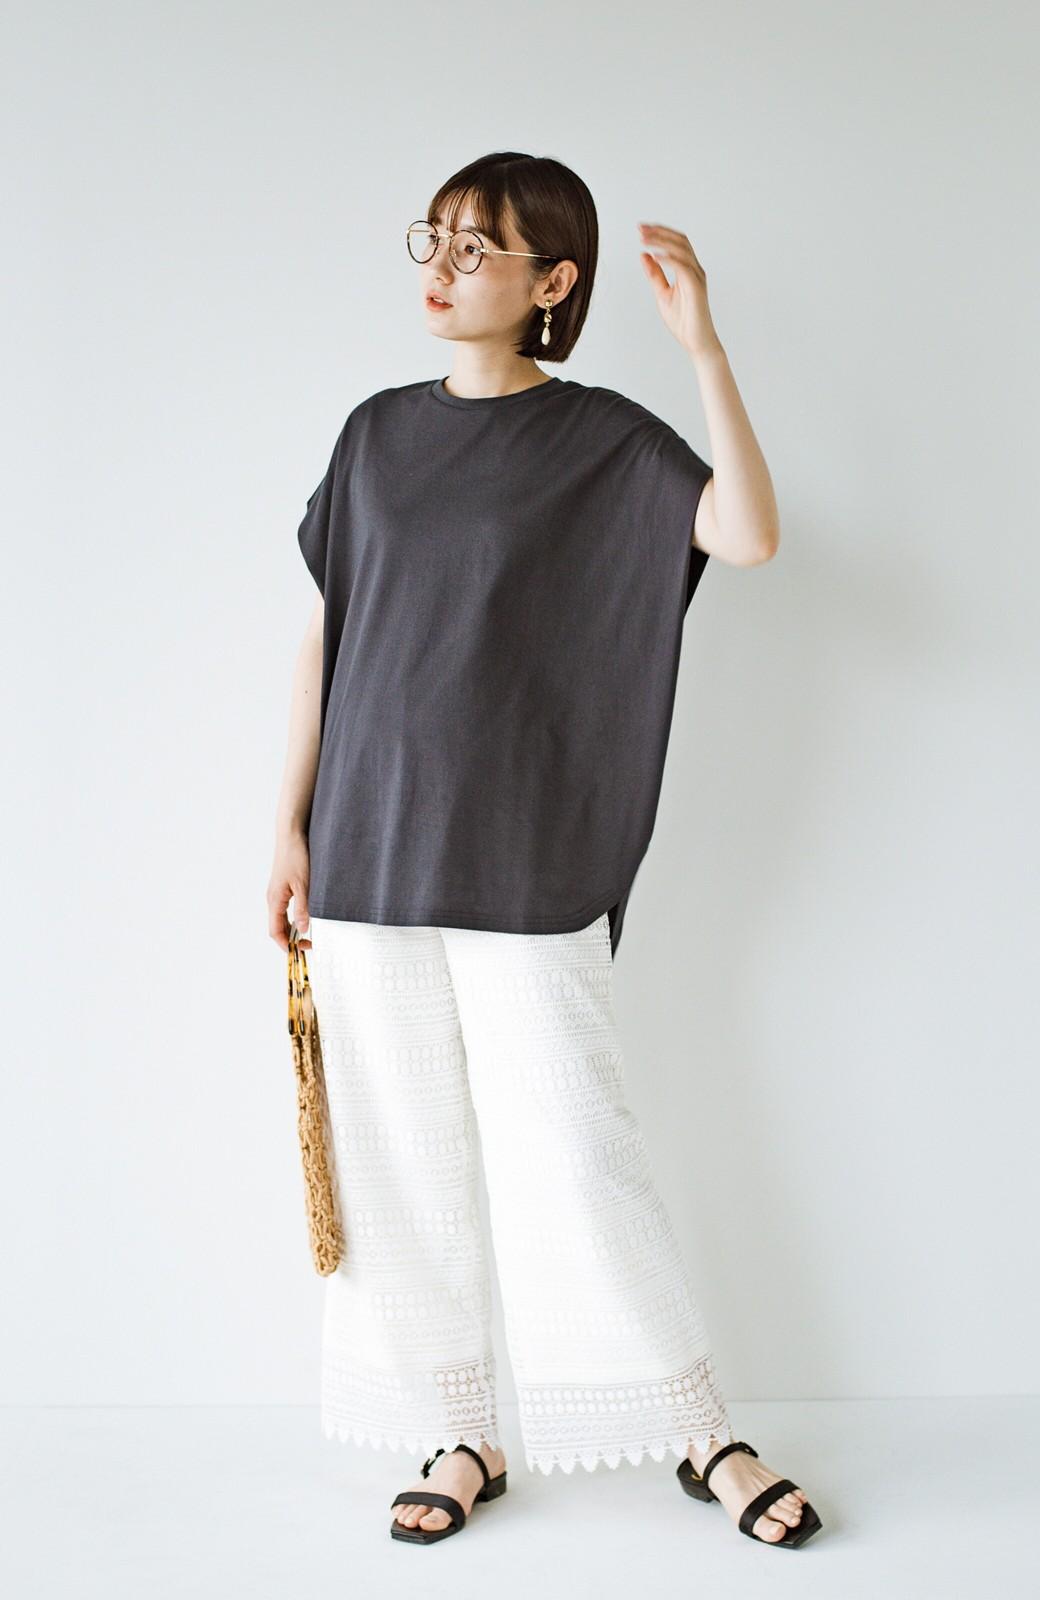 haco! PBPオーガニックコットン 楽ちんなのにブラウス気分で着られる大人のおめかしTシャツ <チャコールグレー>の商品写真14